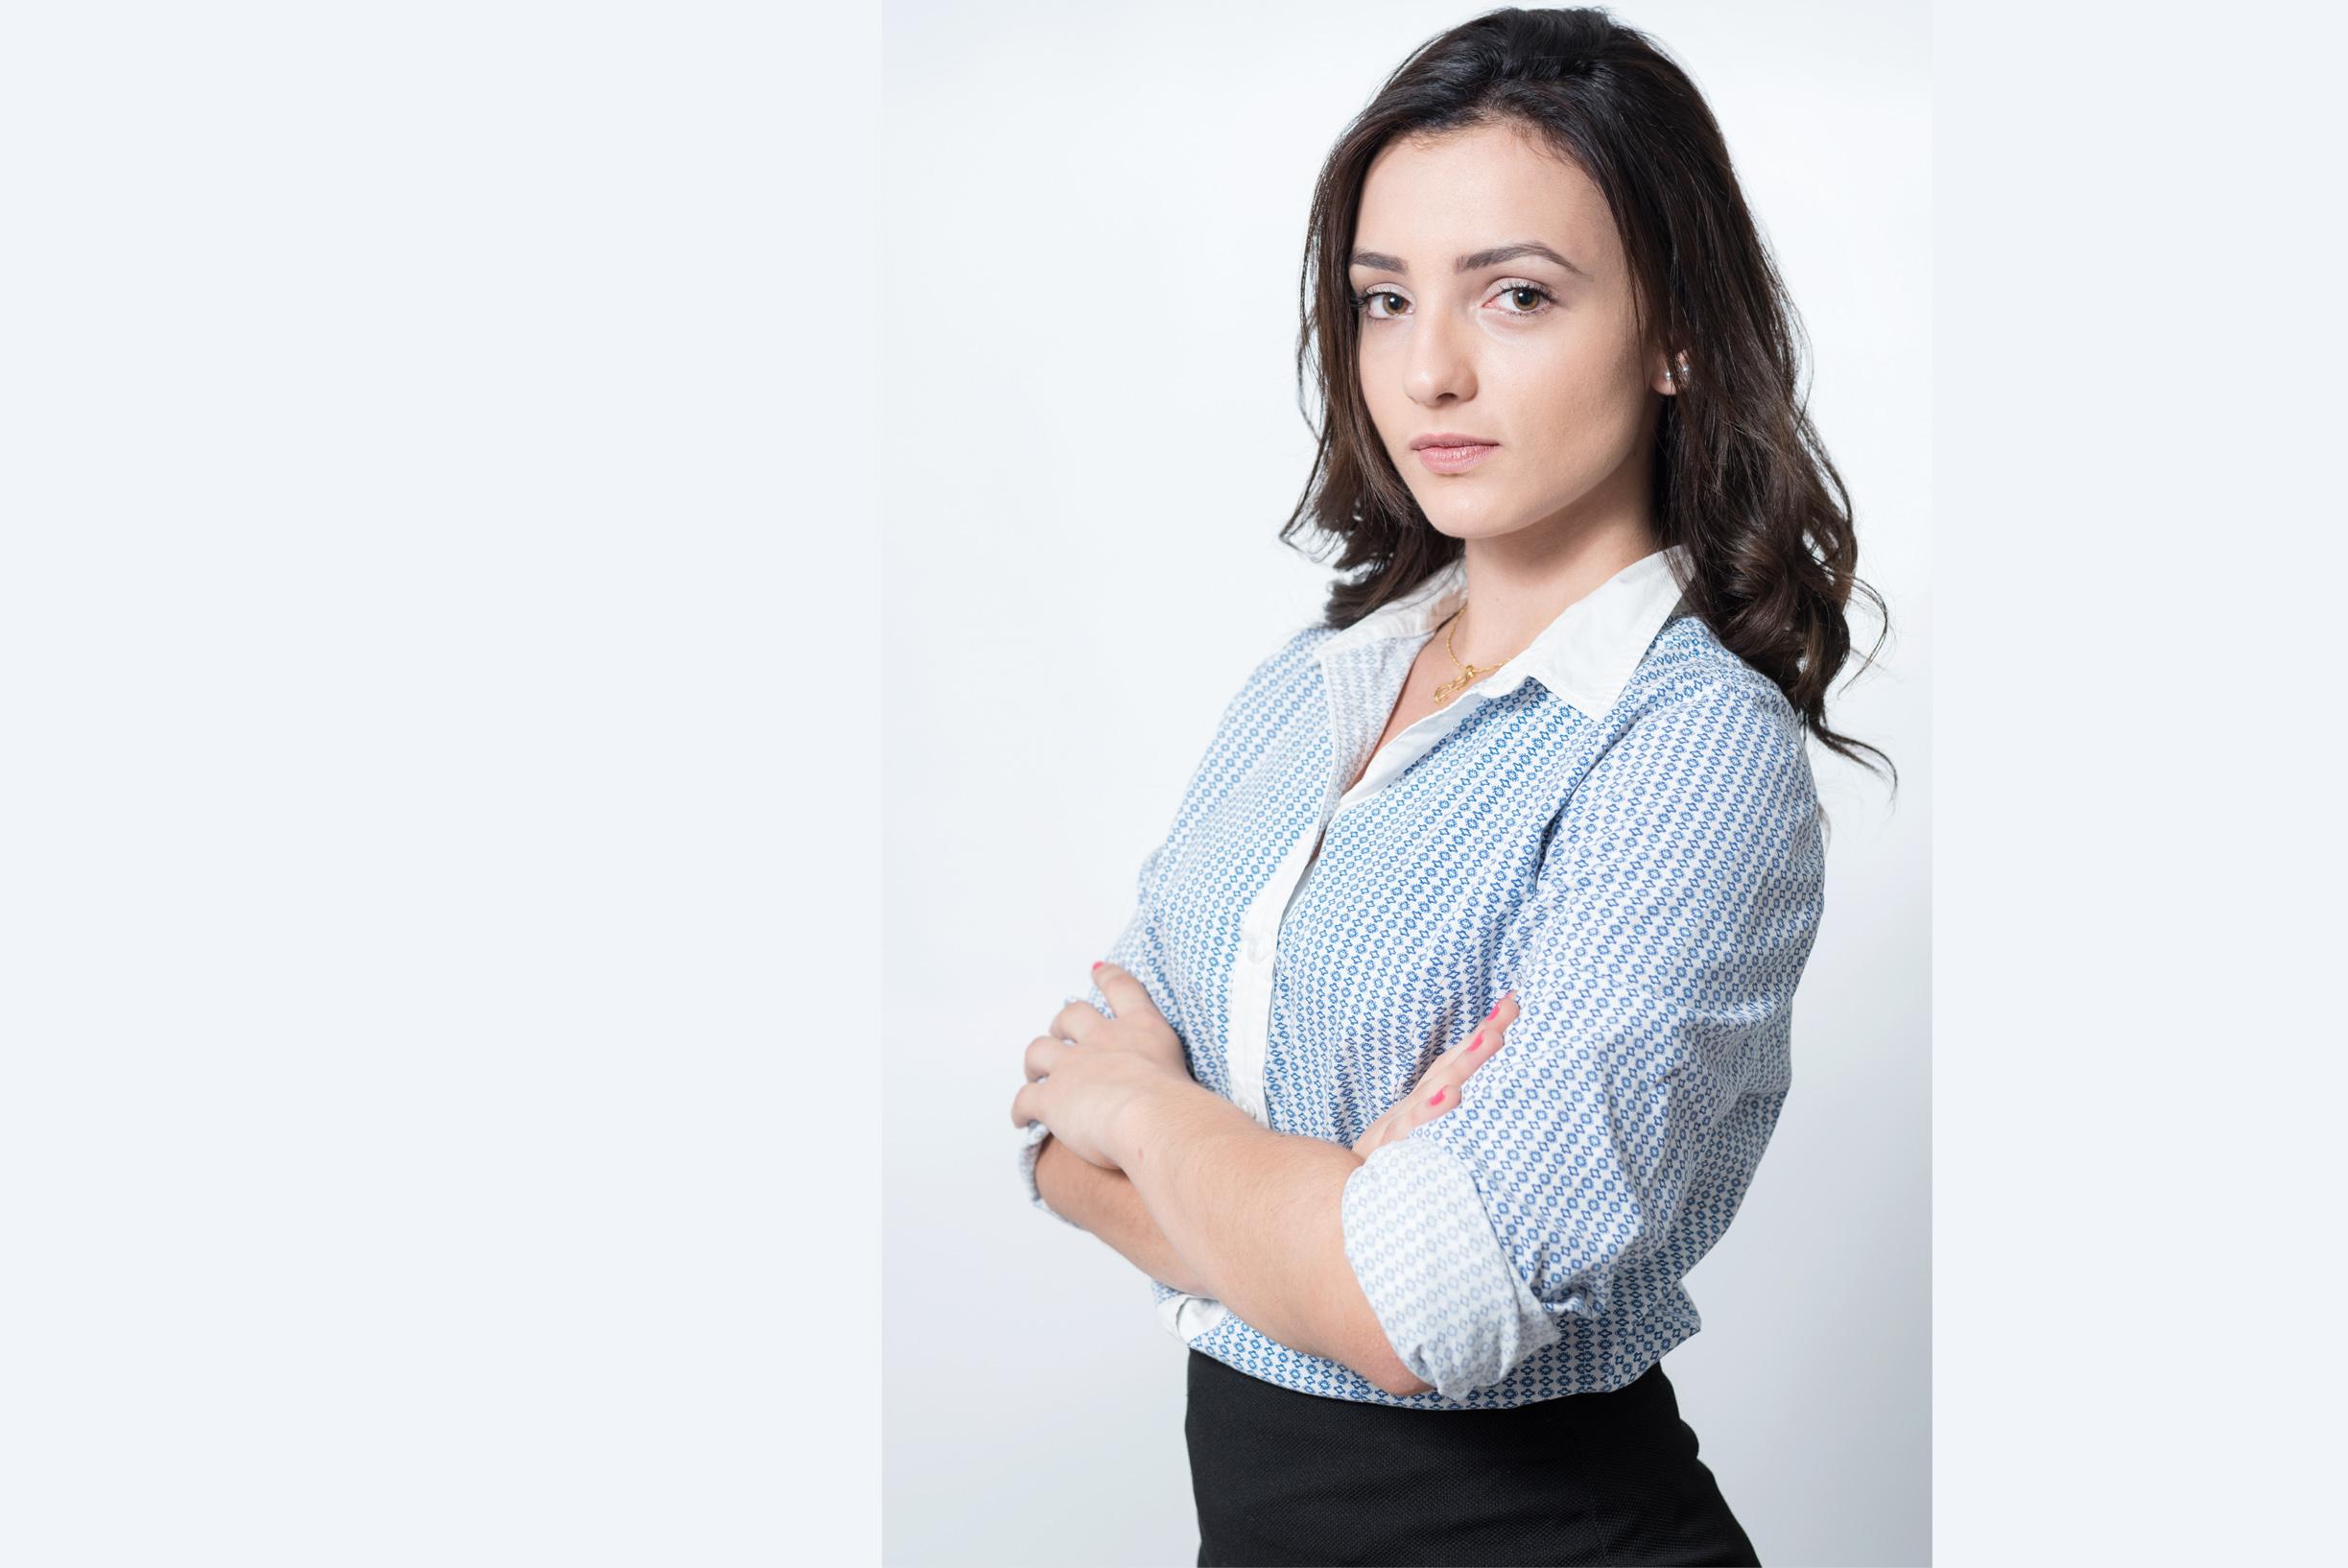 Foto de perfil Linkedin - 5Ystudio